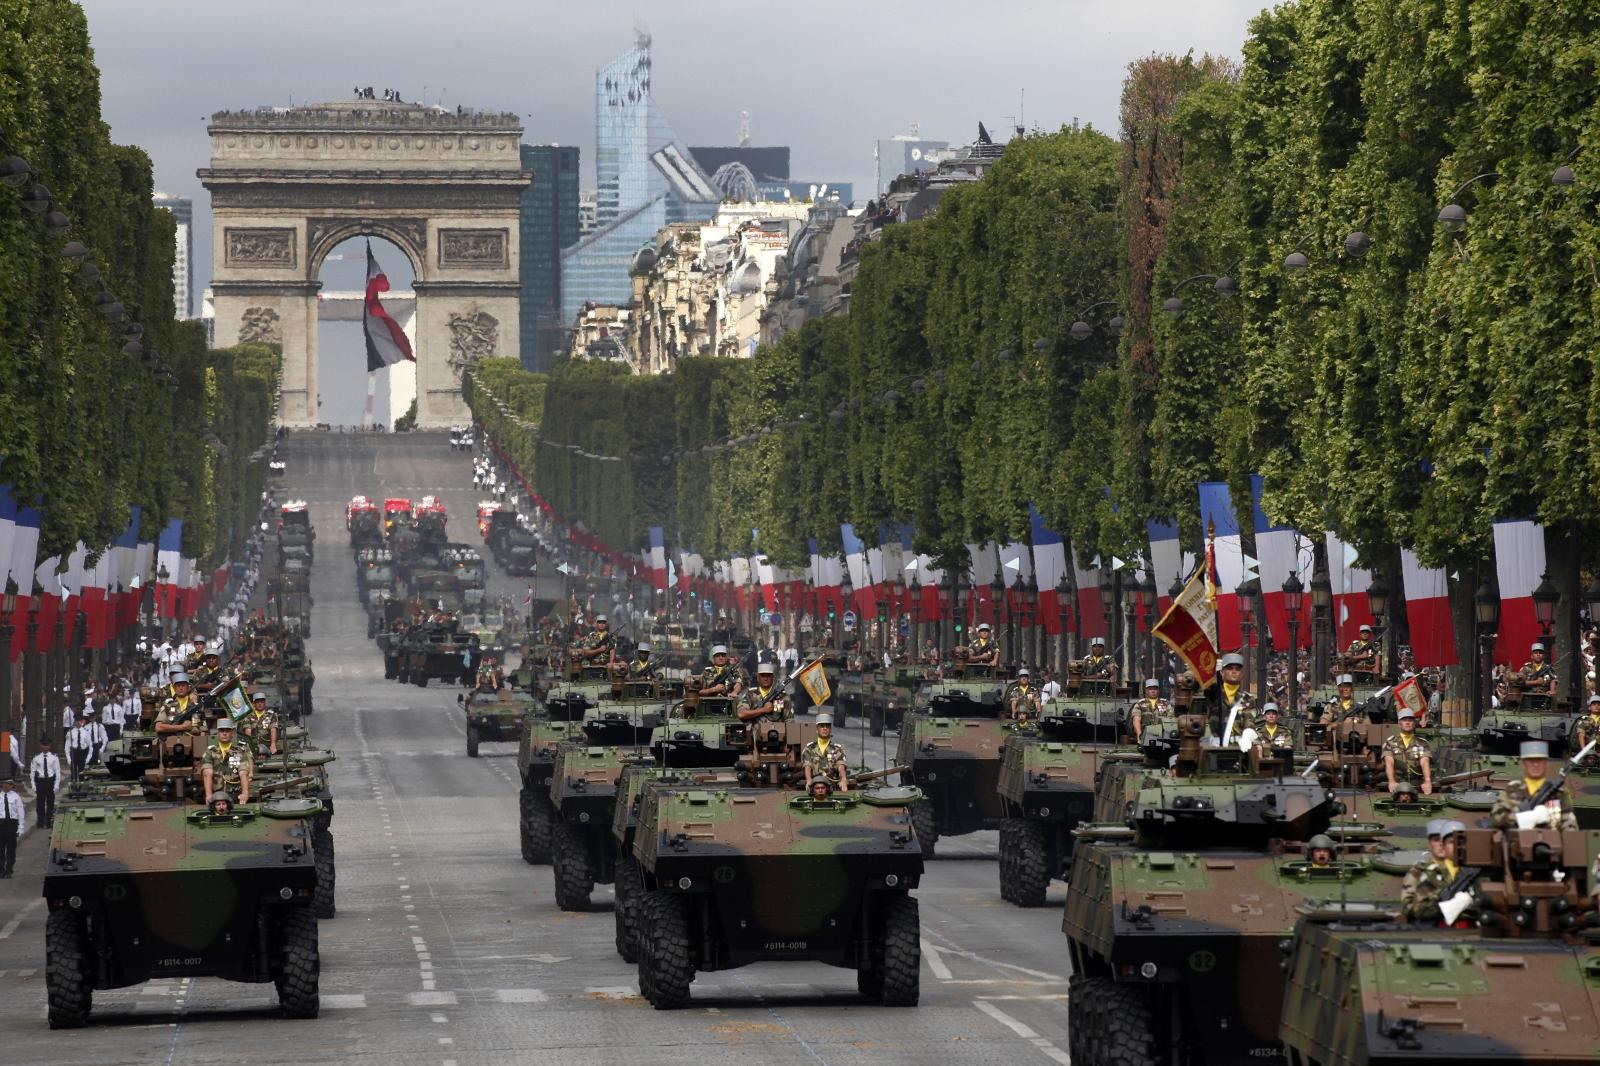 est100 一些攝影(some photos): Bastille Day parade, 巴士底日/ 法國國慶日 閱兵